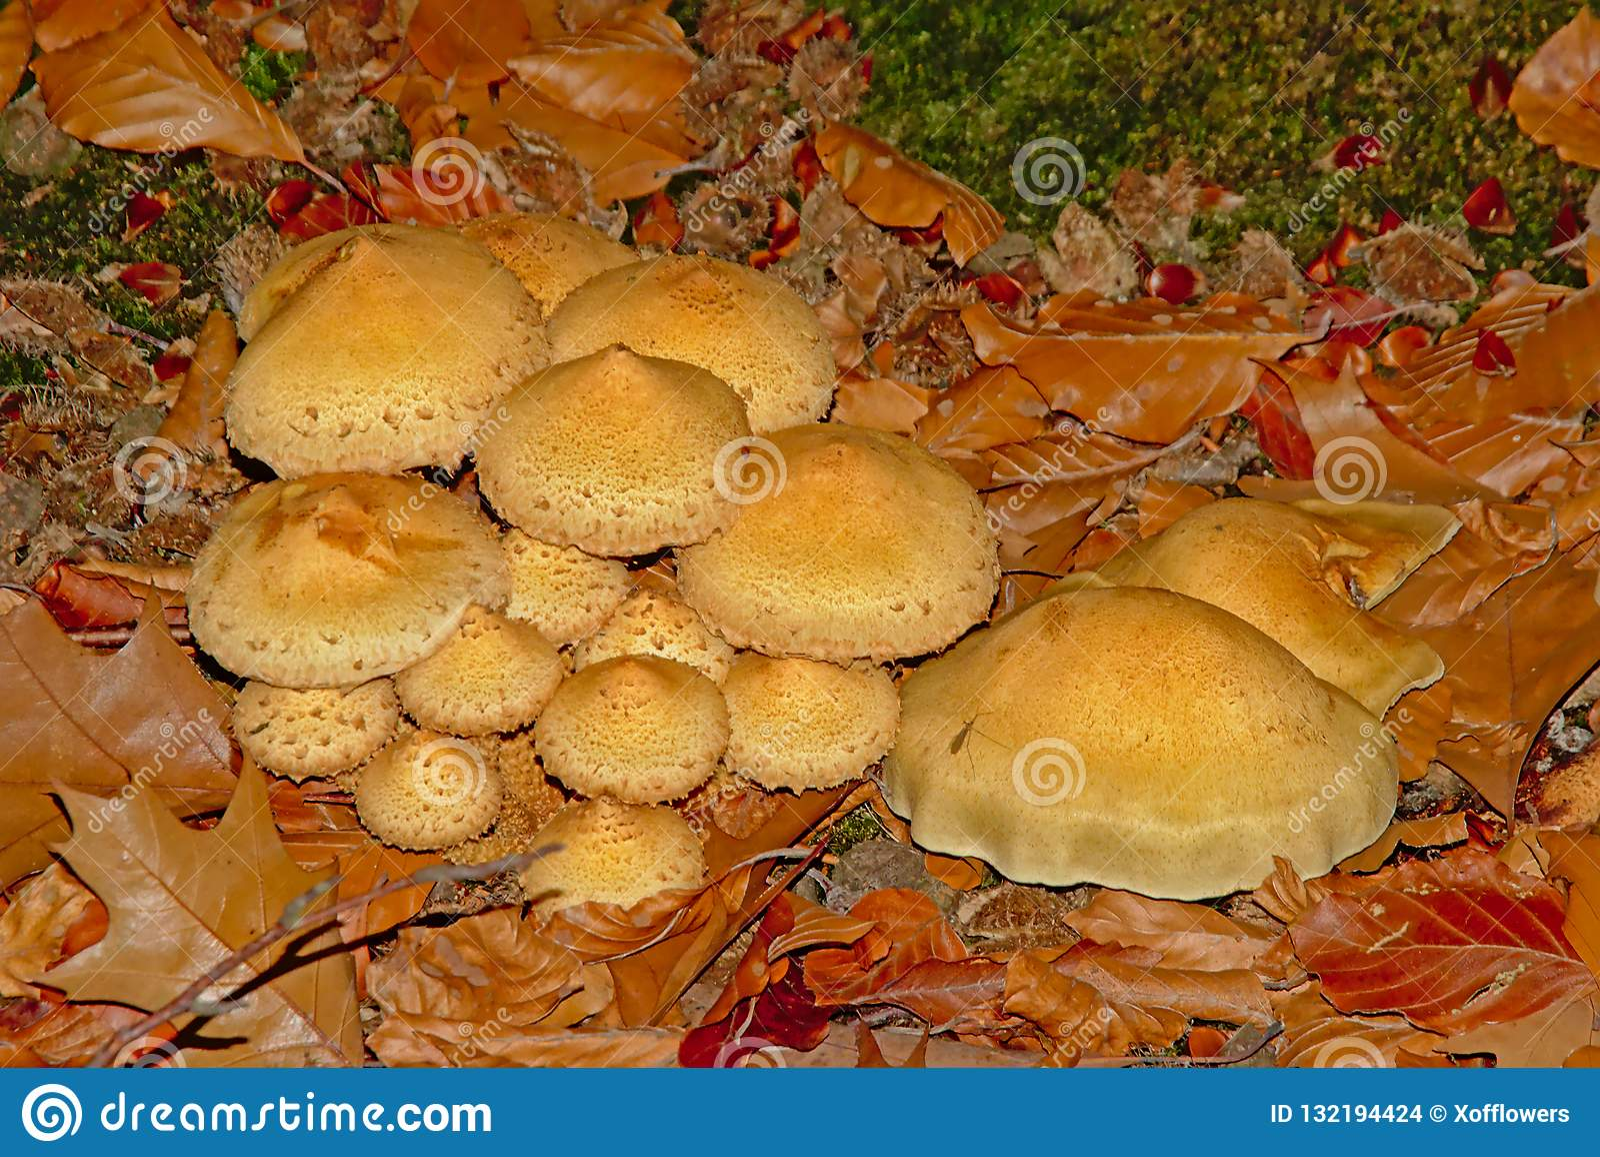 Flowerpot parasol mushrooms - Leucocoprinus birnbaumii